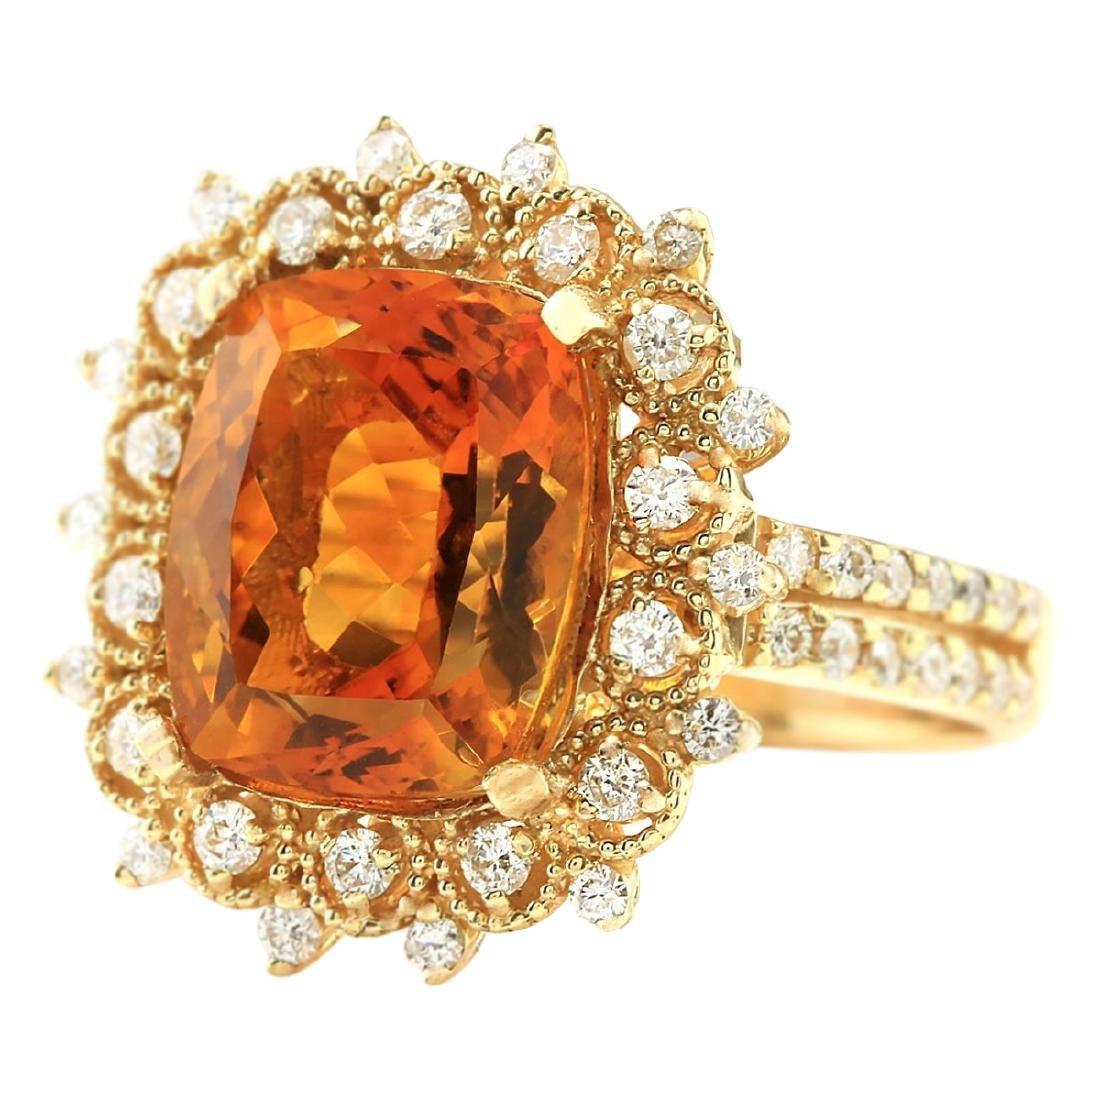 6.39 CTW Natural Madeira Citrine And Diamond Ring 18K - 2